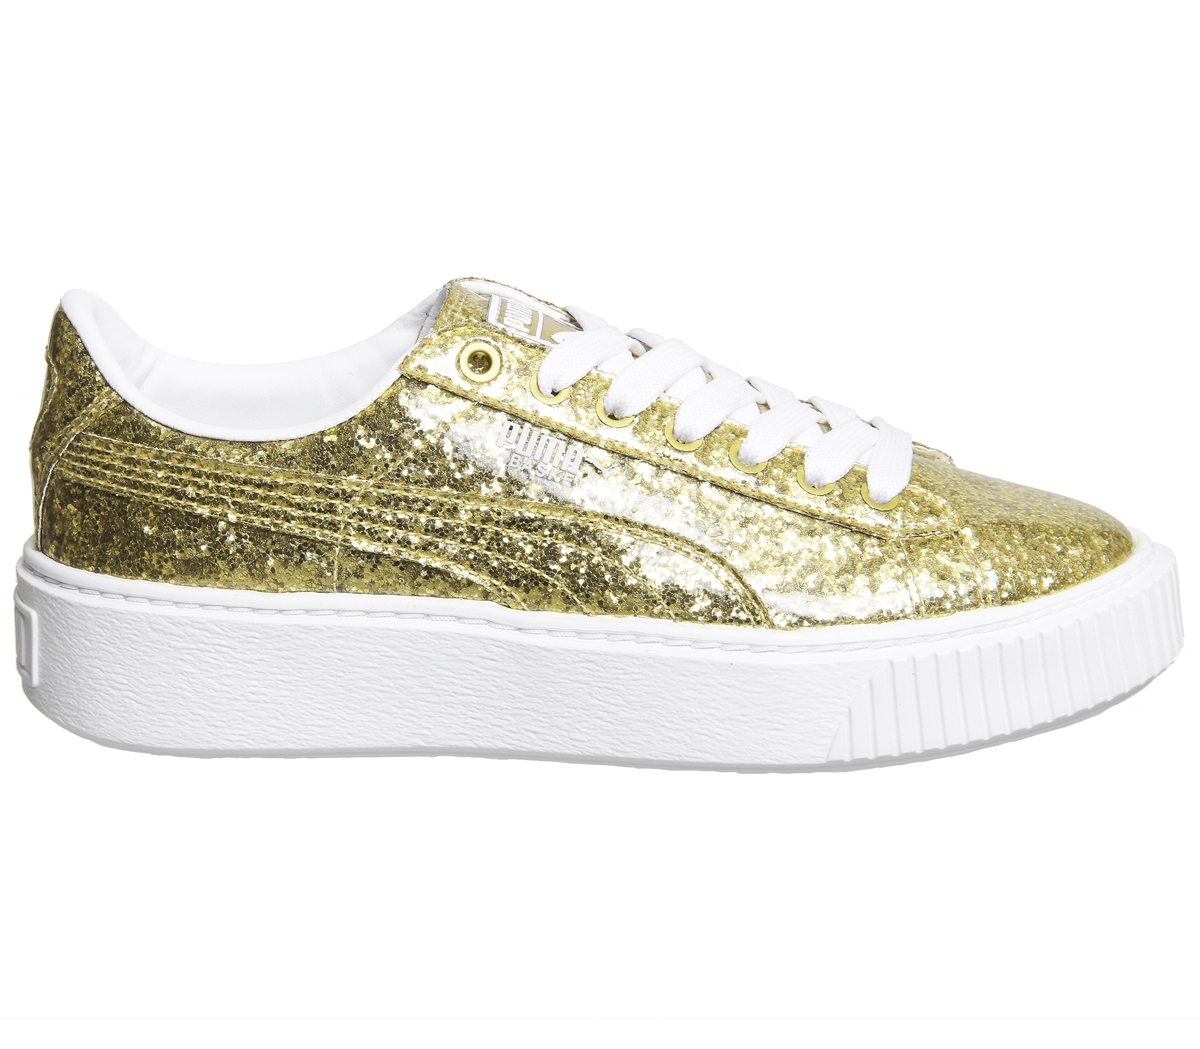 24ec8ec15ca6a Womens Puma Basket Platform Trainers Gold Glitter White Trainers ...